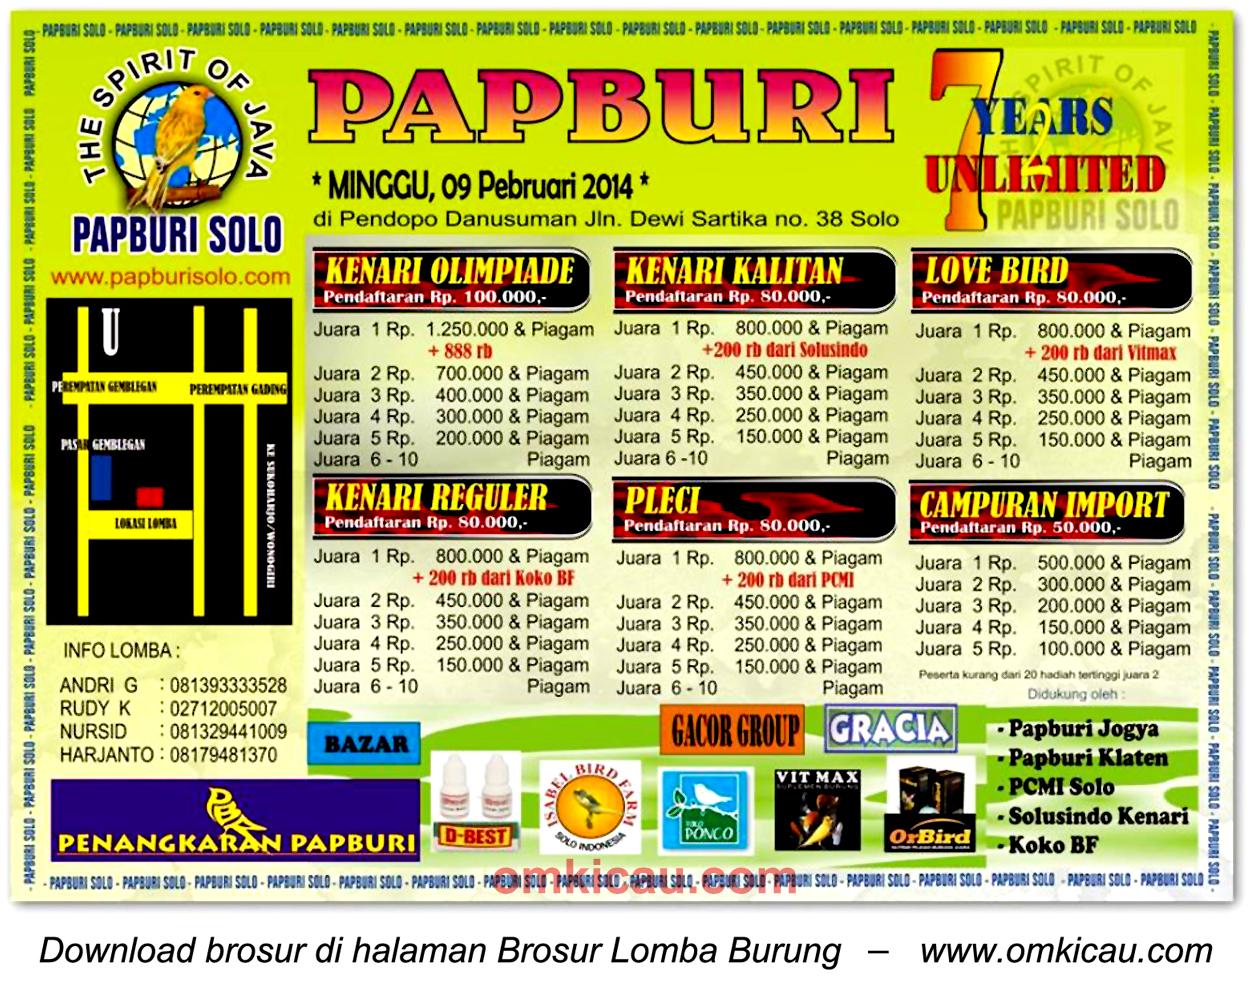 Brosur Lomba Burung 7 Years Unlimited Papburi, Solo, 9 Februari 2014